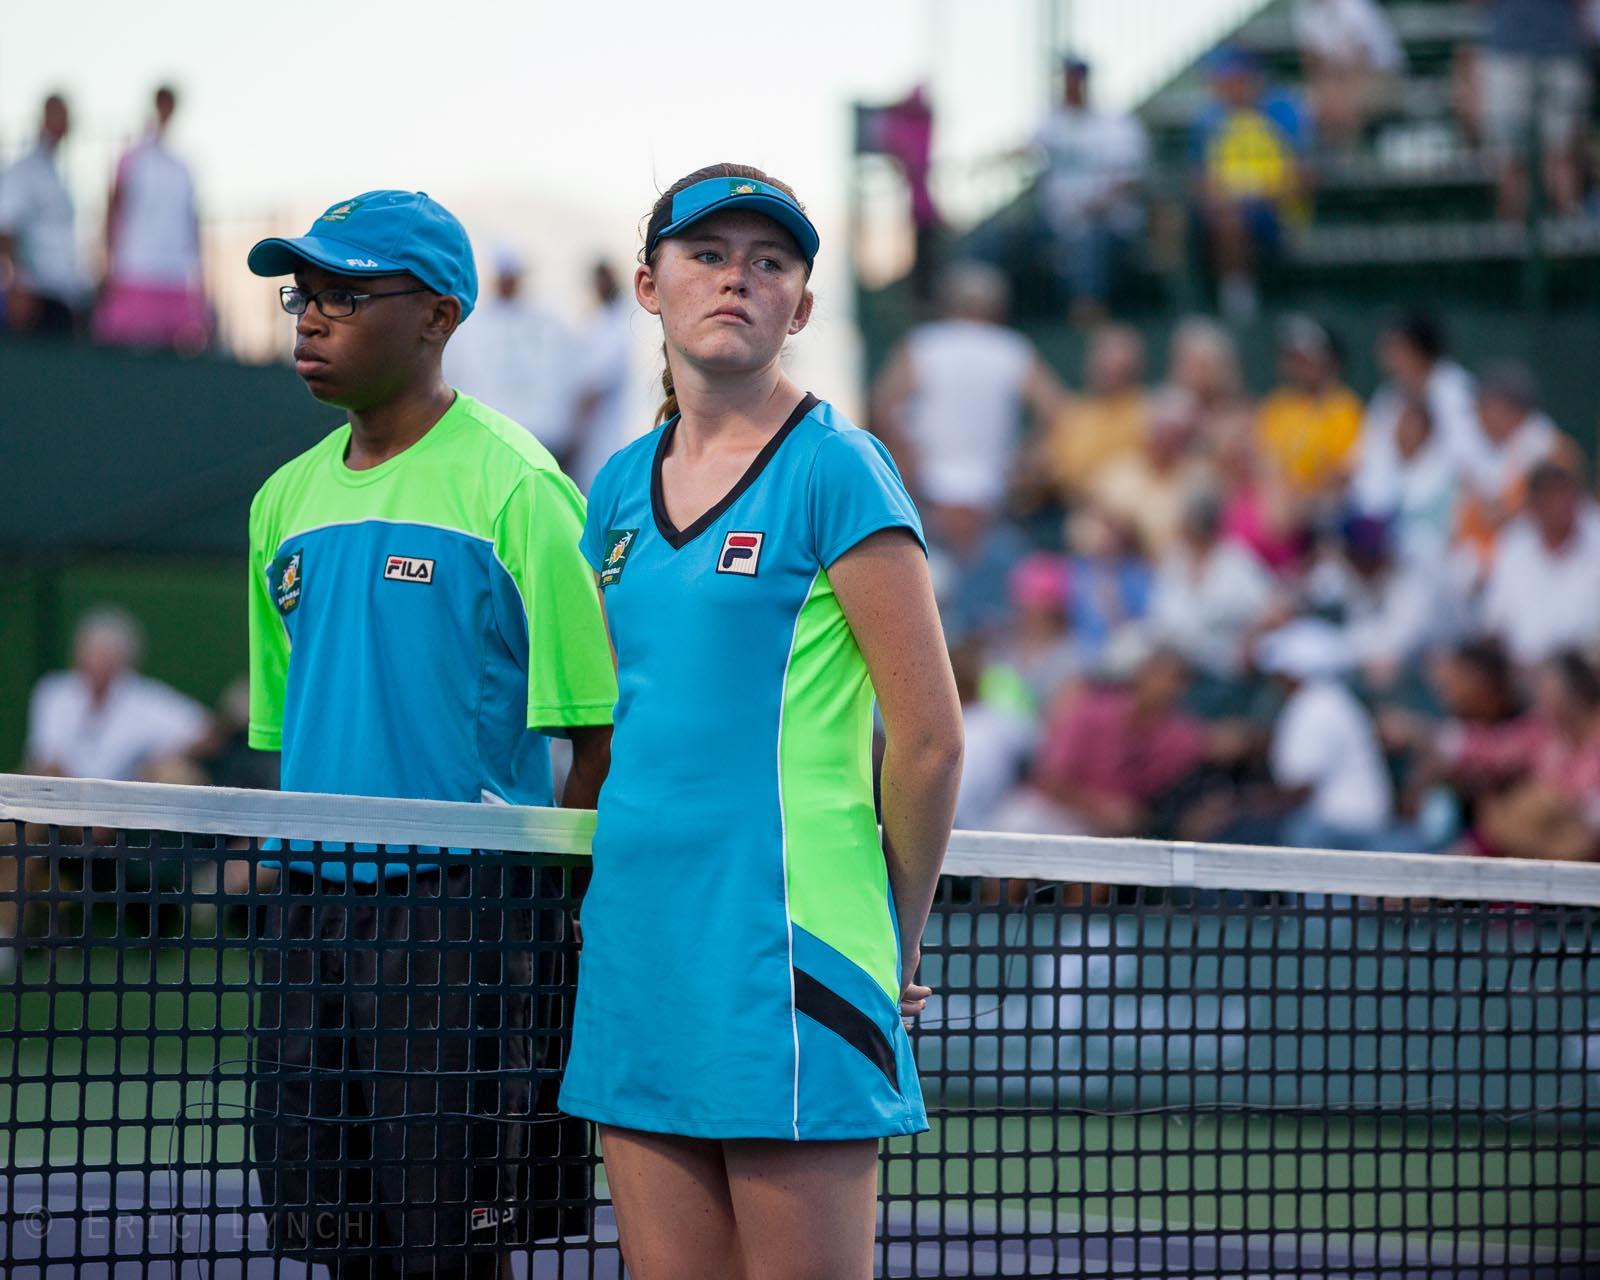 Lynch_TennisPeople-104.jpg